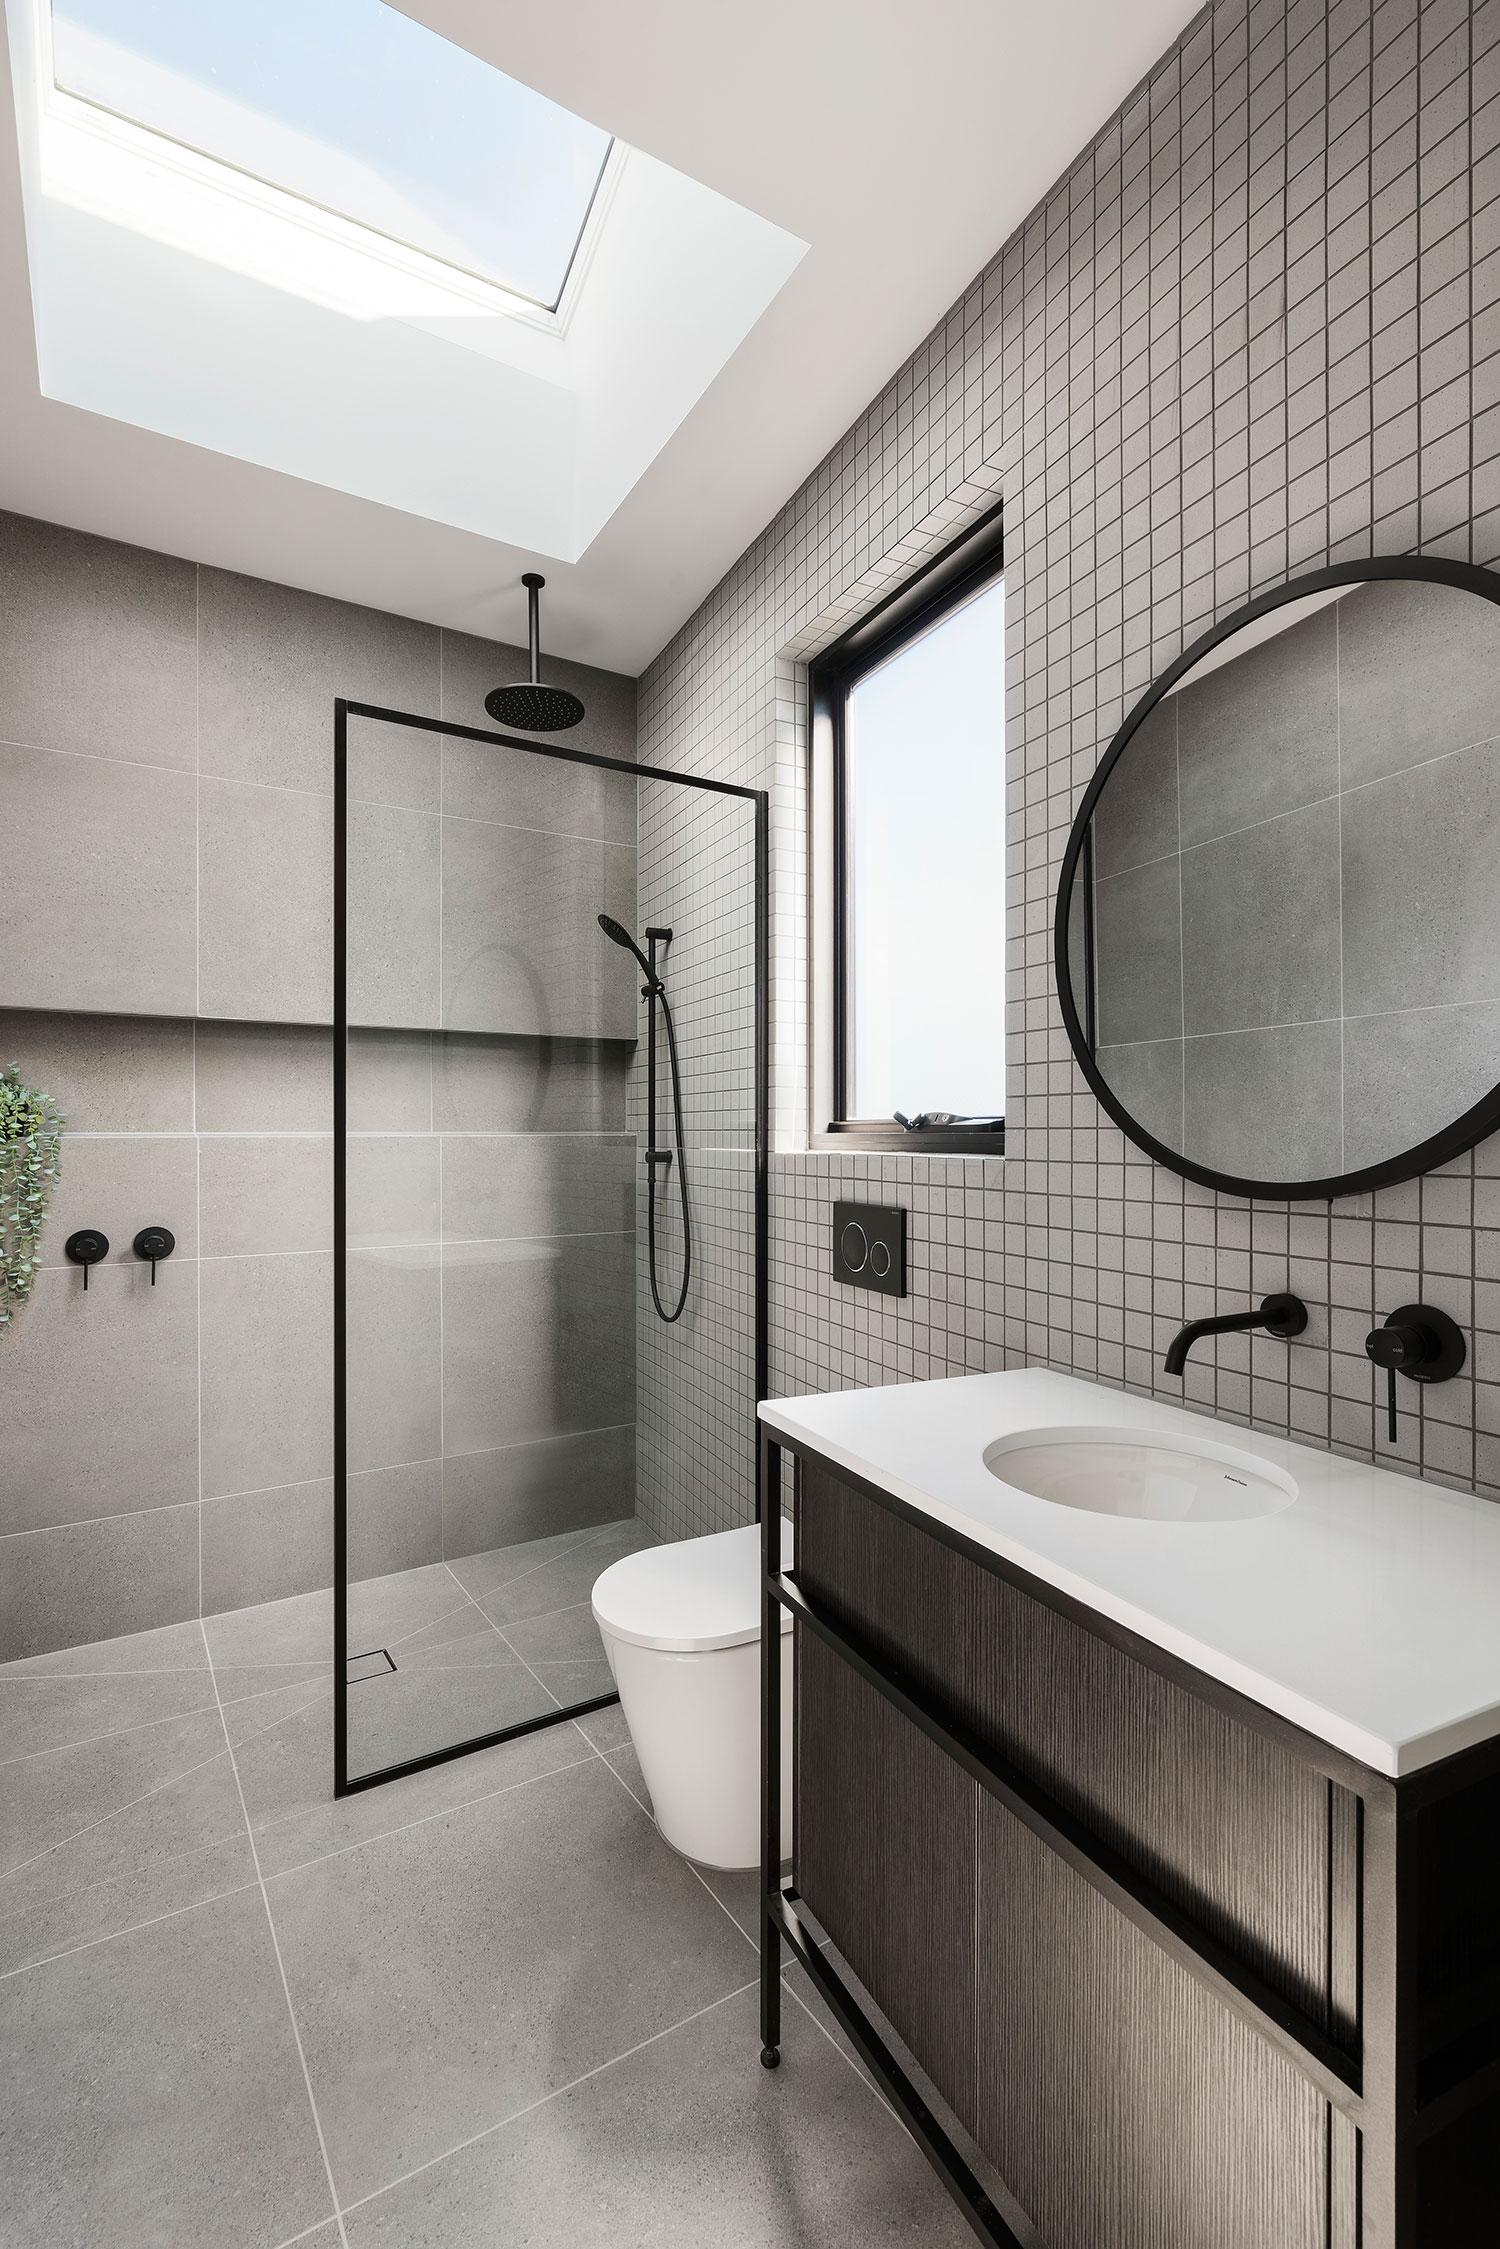 osborne-townhouse-interior-design-bathroom-ckariouz-architects4